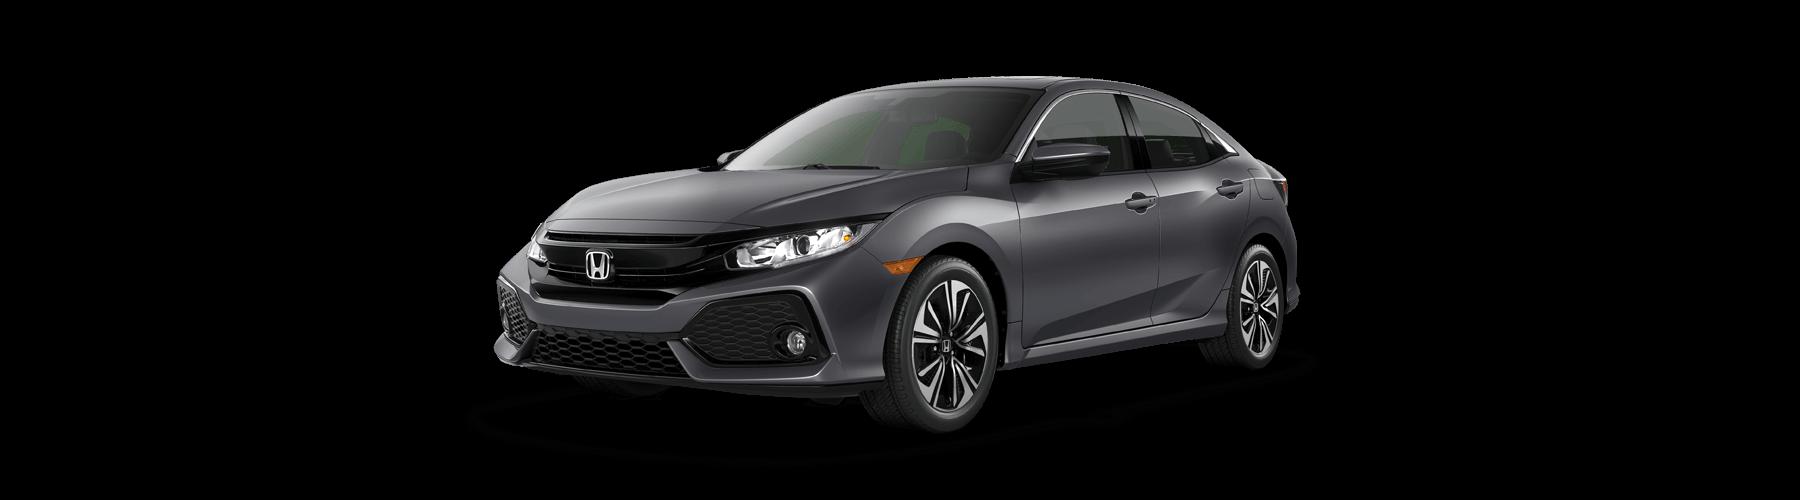 2018 Honda Civic Hatchback Front Angle